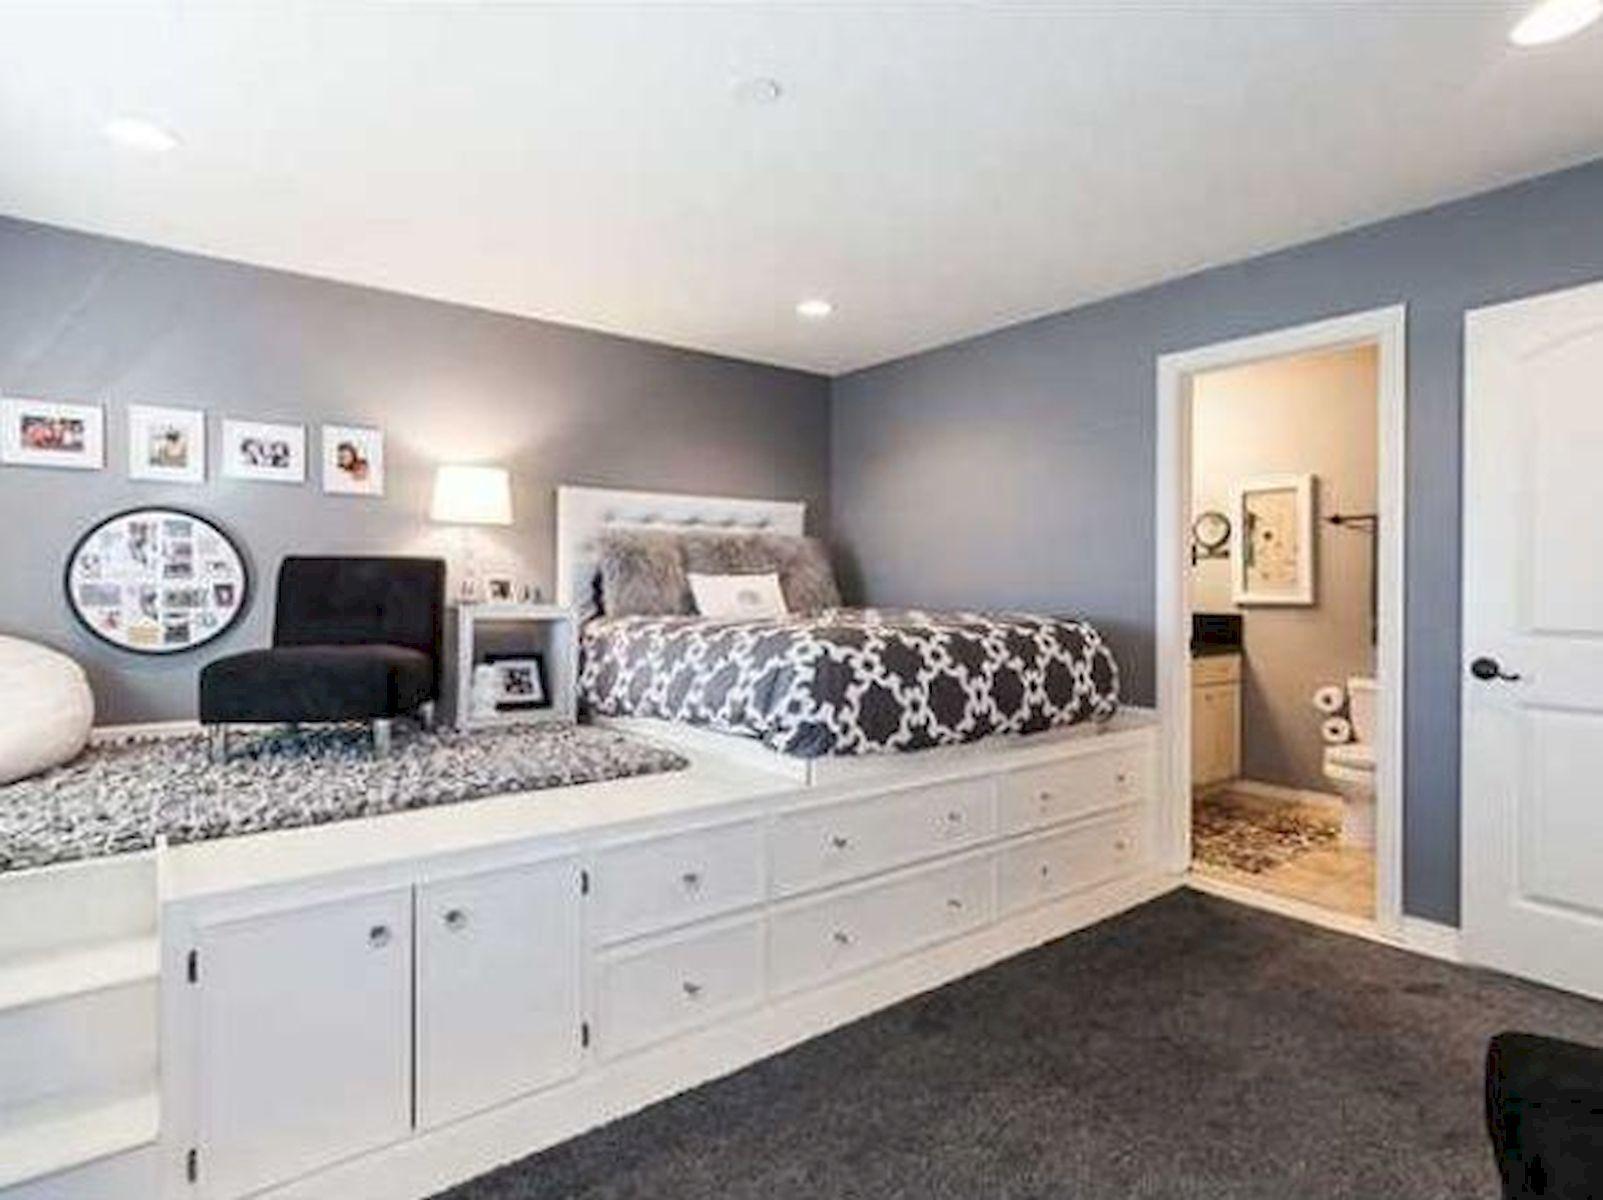 Amazing Bedroom Design Ideas images